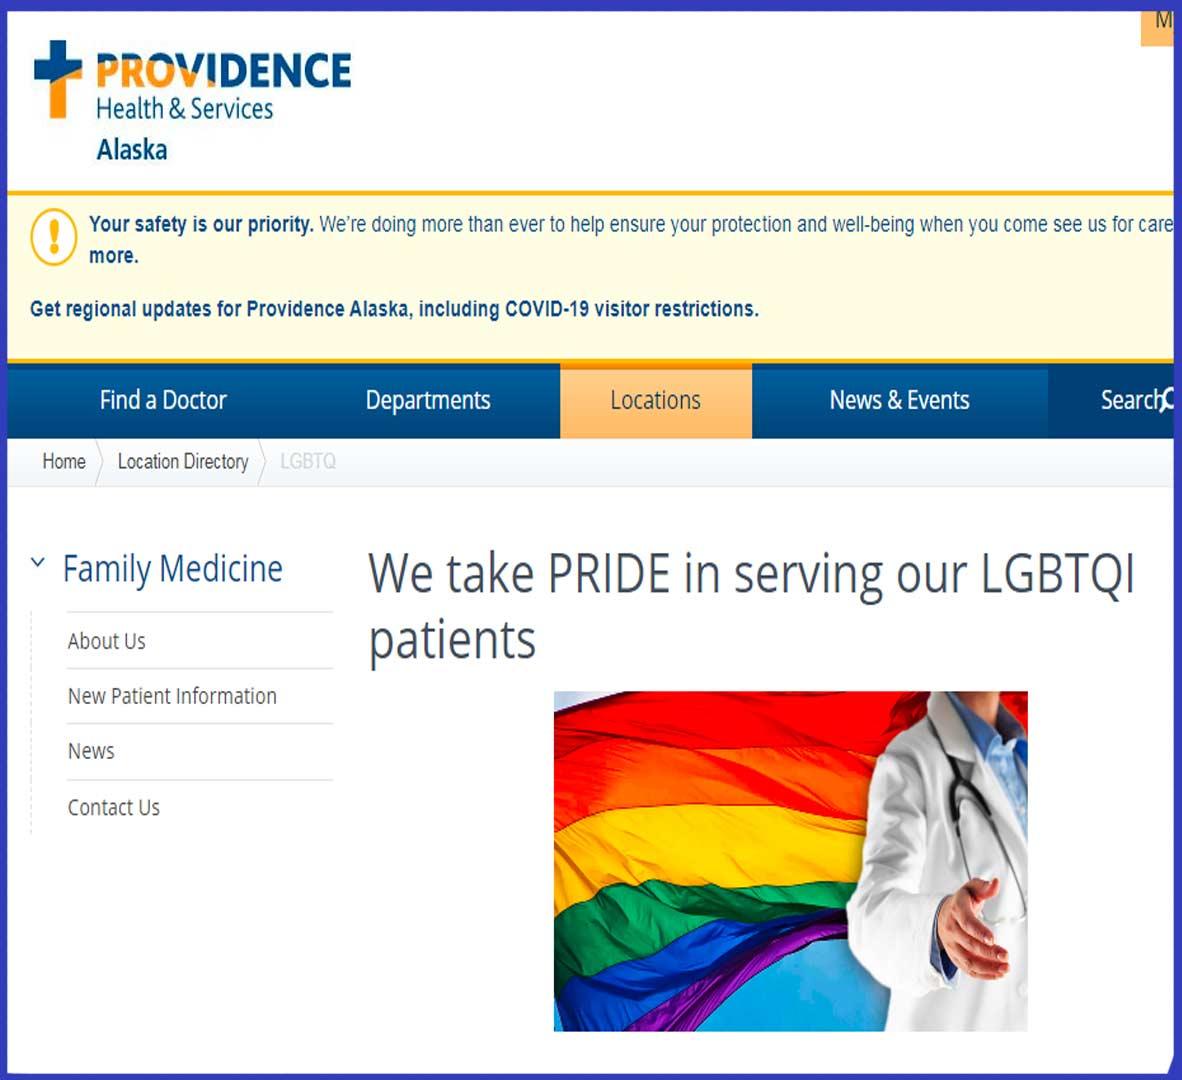 Providence image